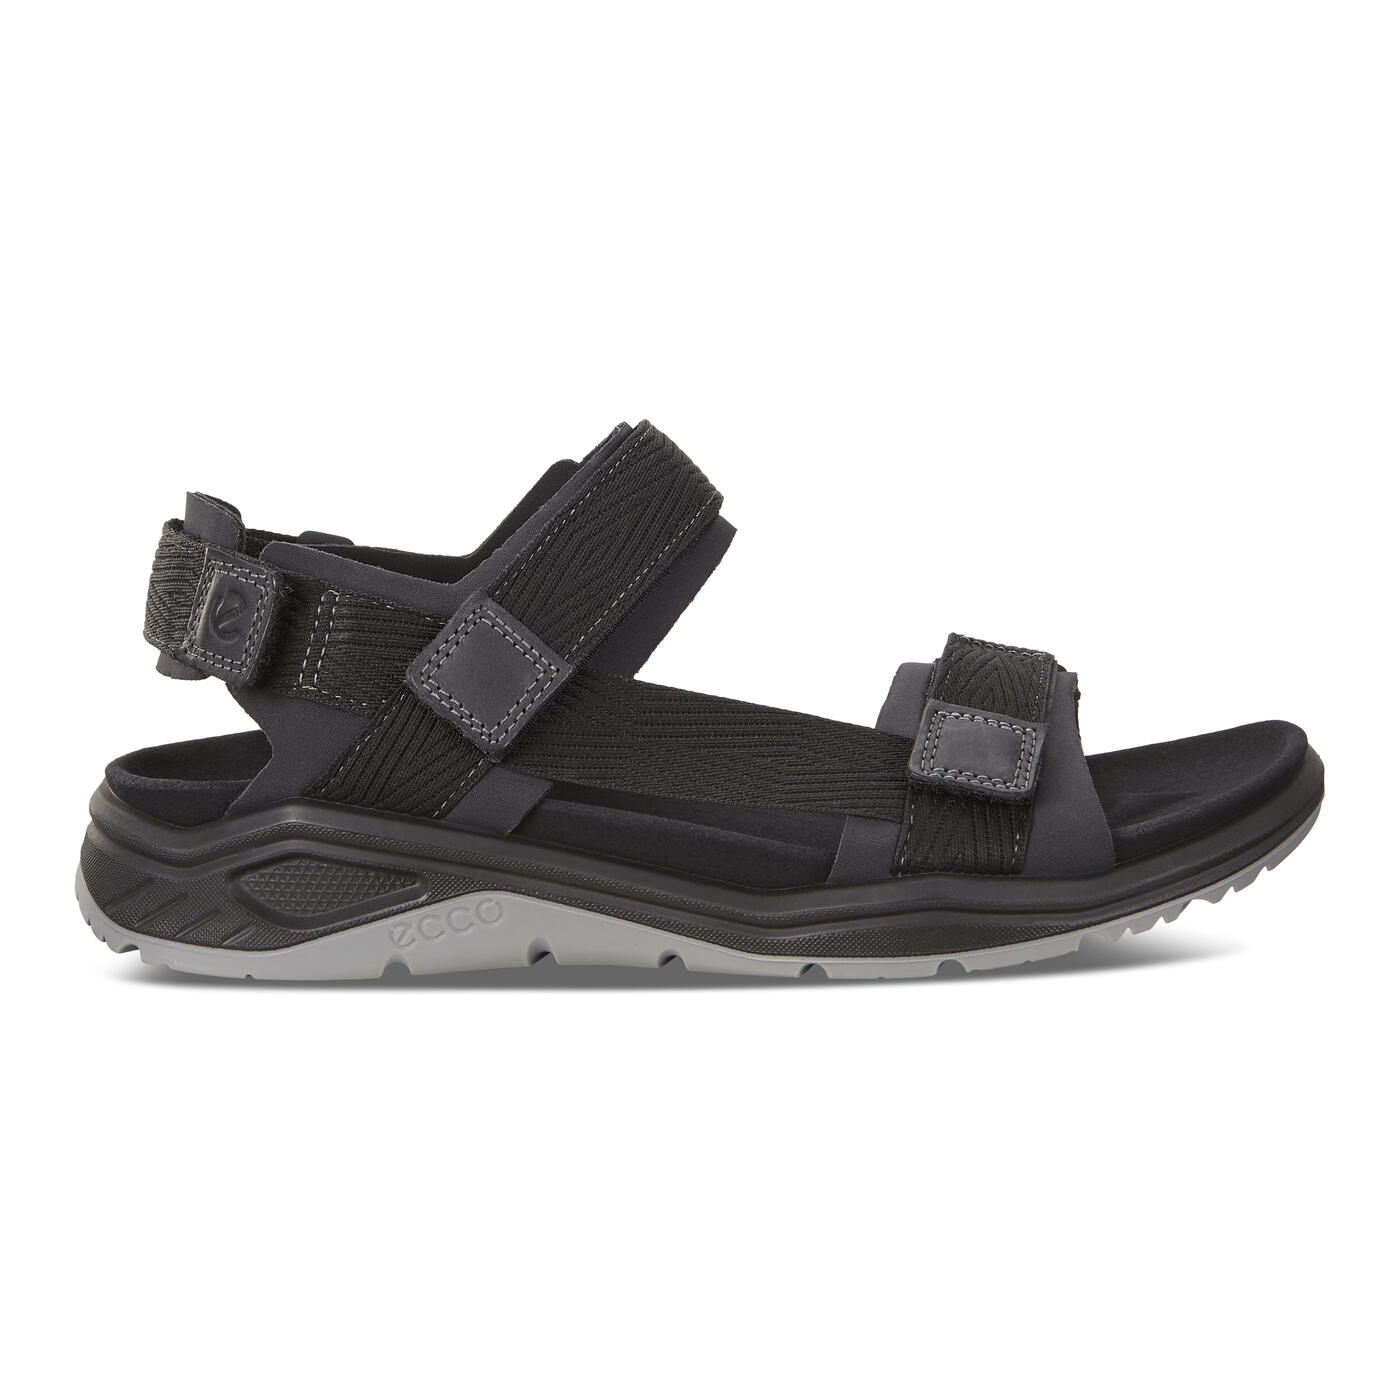 ECCO X-TRINSIC Textile Men's Sandal